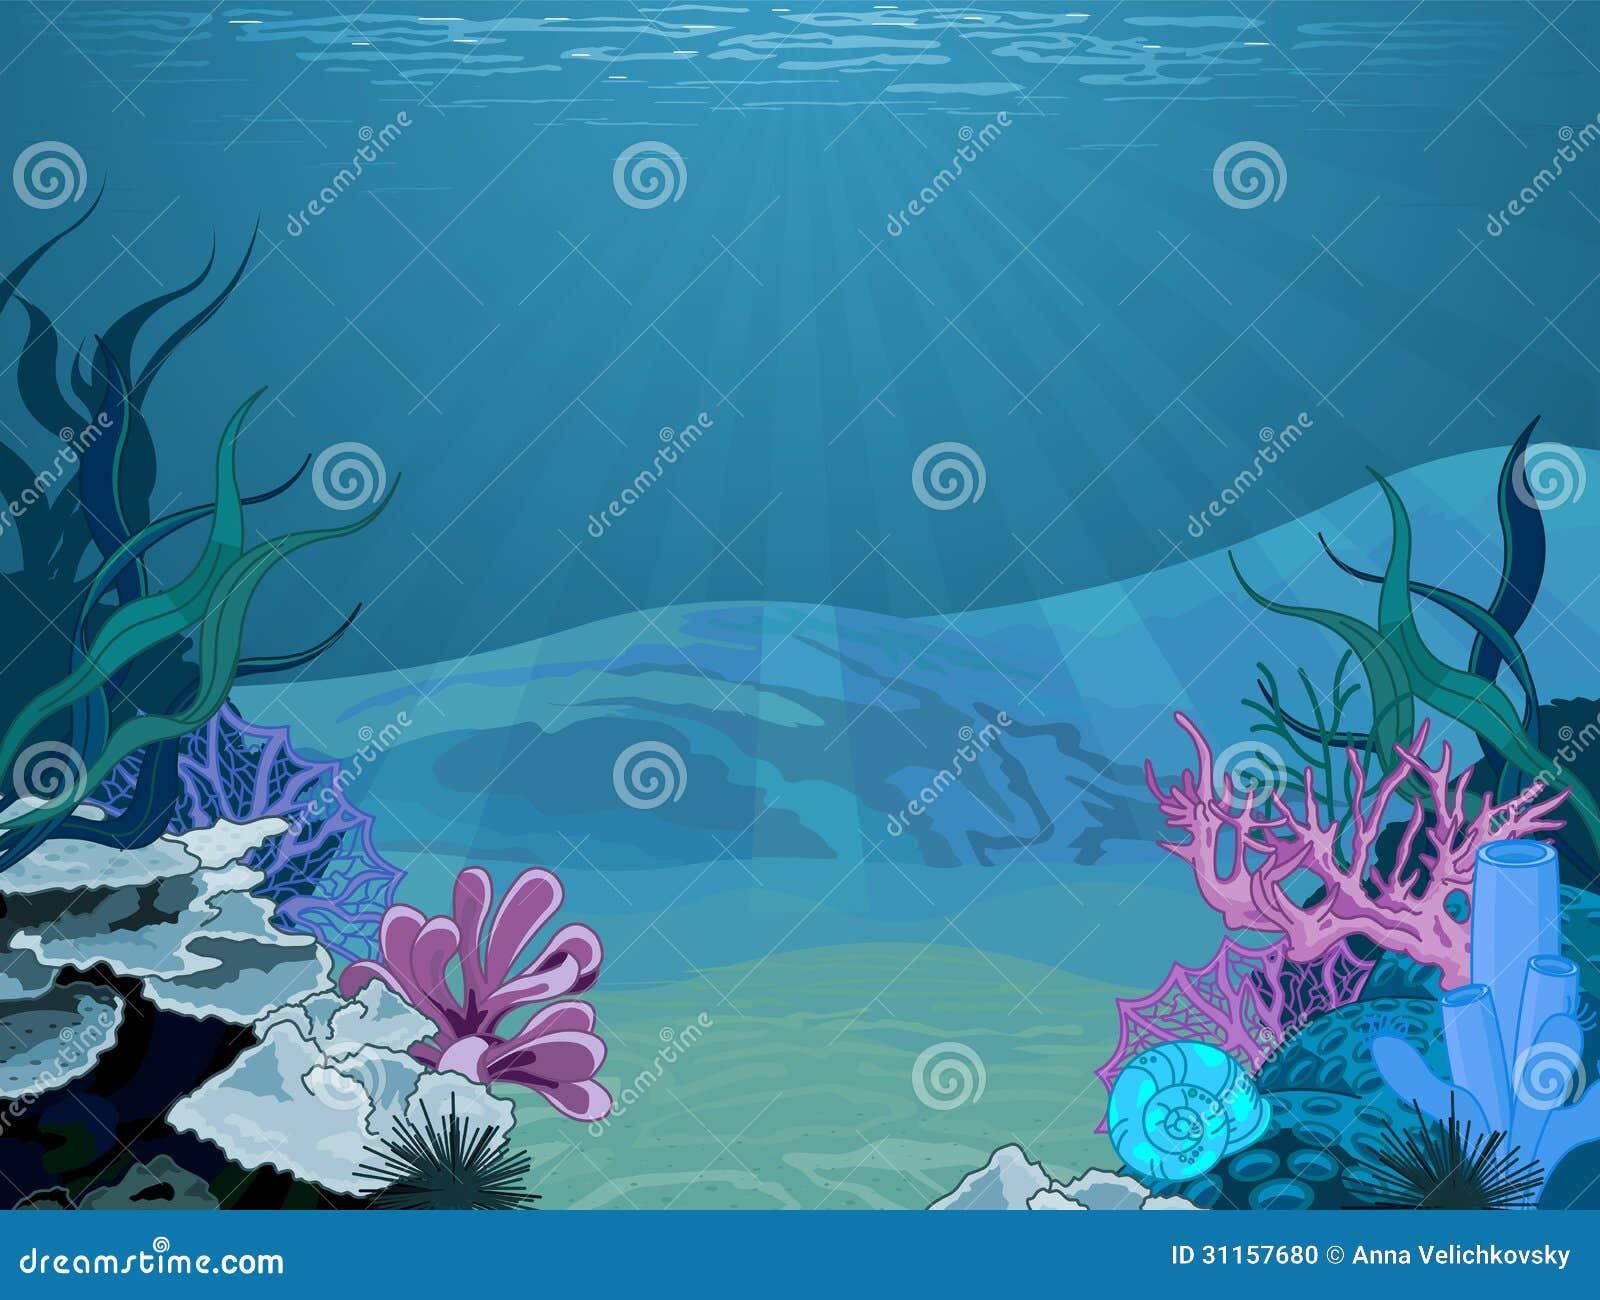 a vector illustration of marine underwater scene stock vector